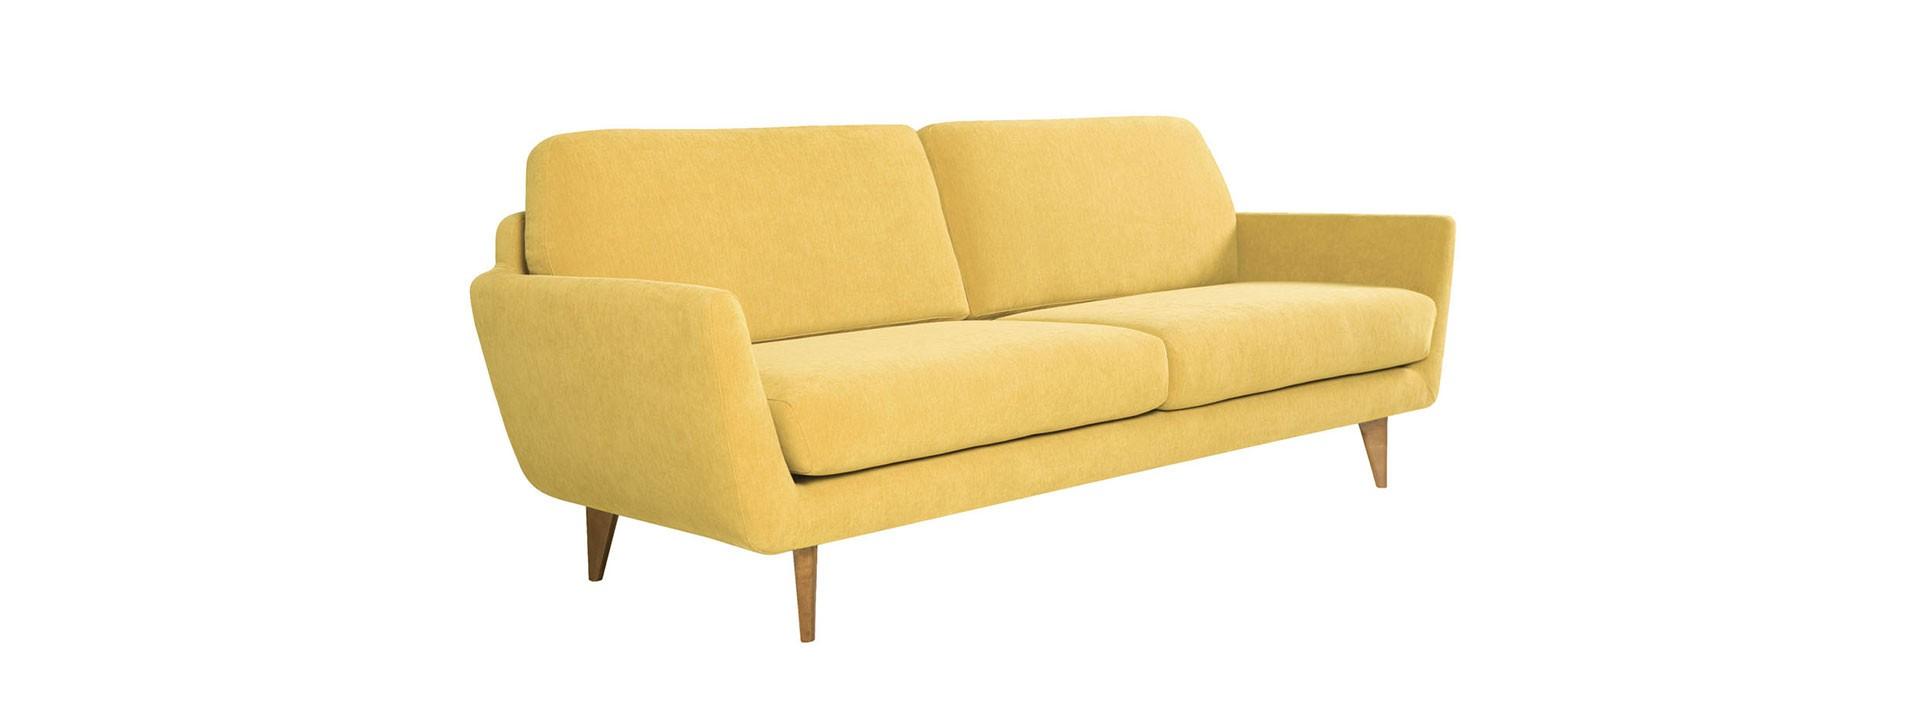 Canape Sur Mesure Design